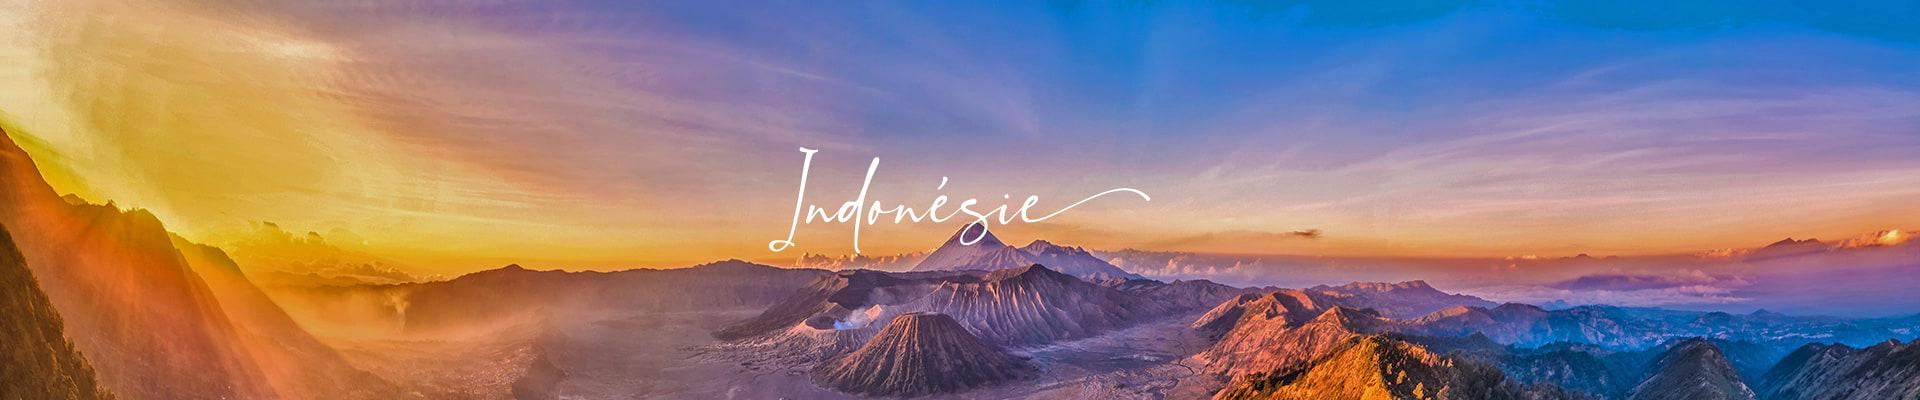 images/panos/desktop/indonesie